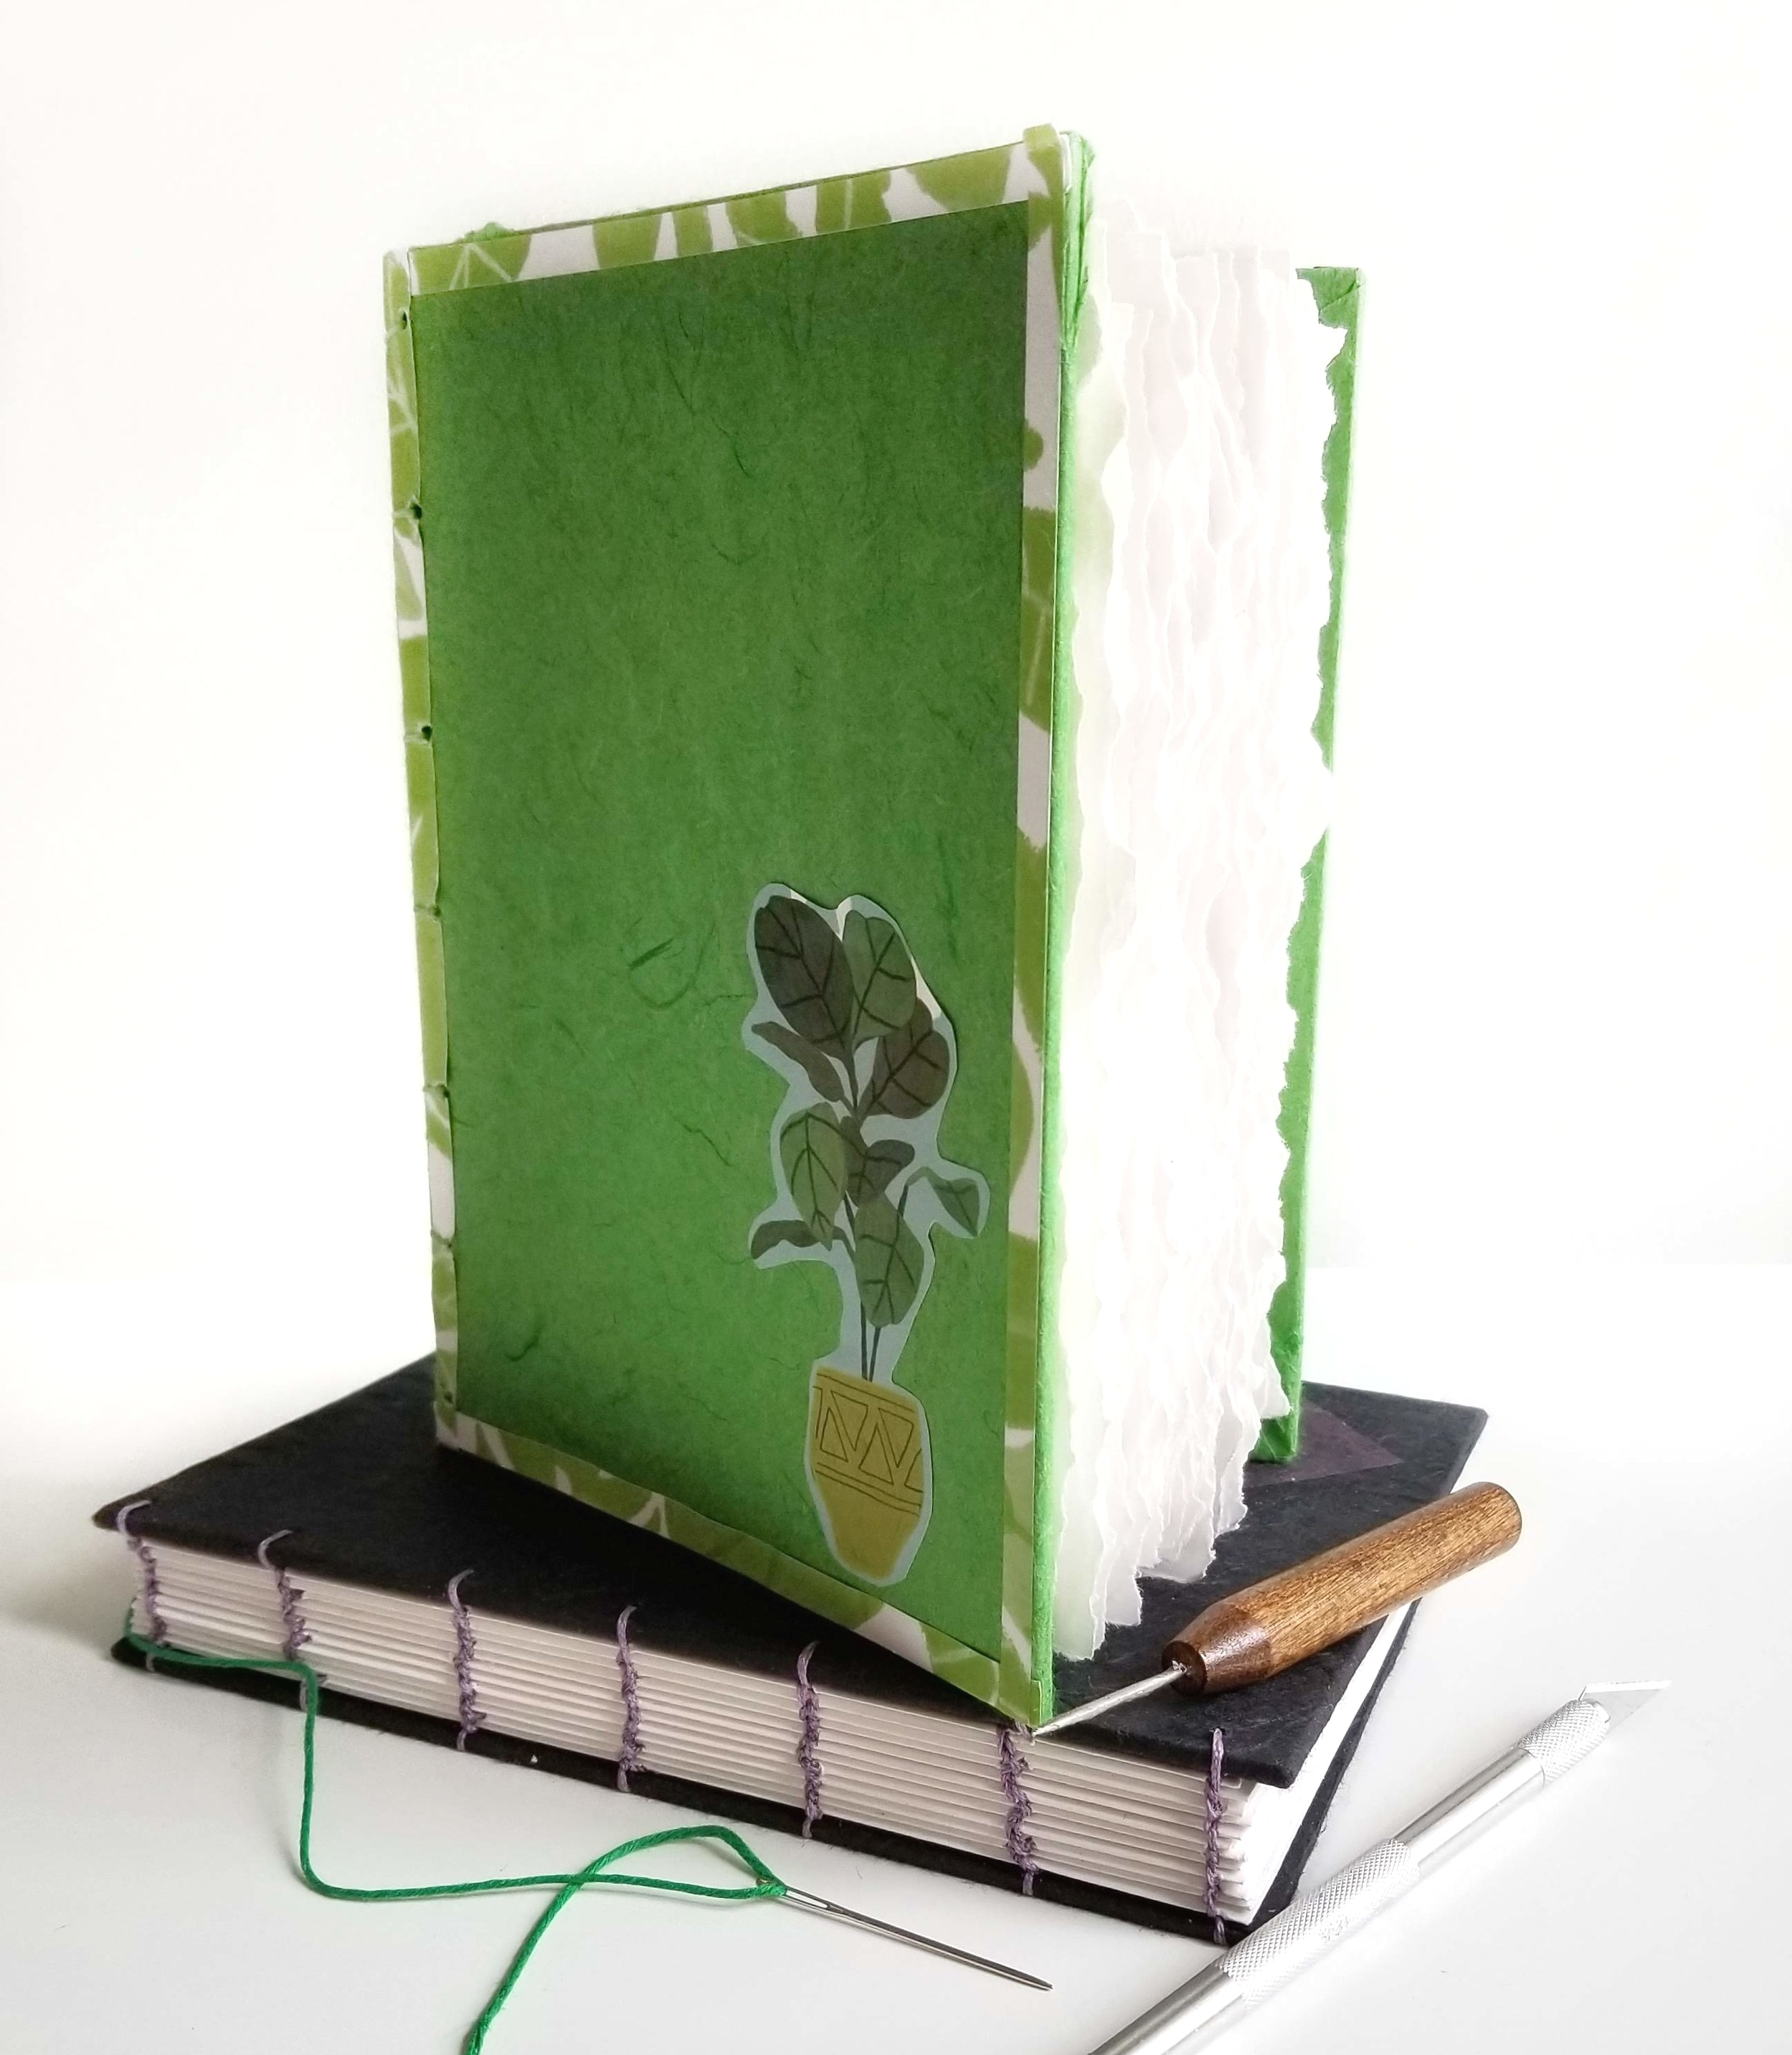 bookbinding-coptic-stitch-workshop-portland